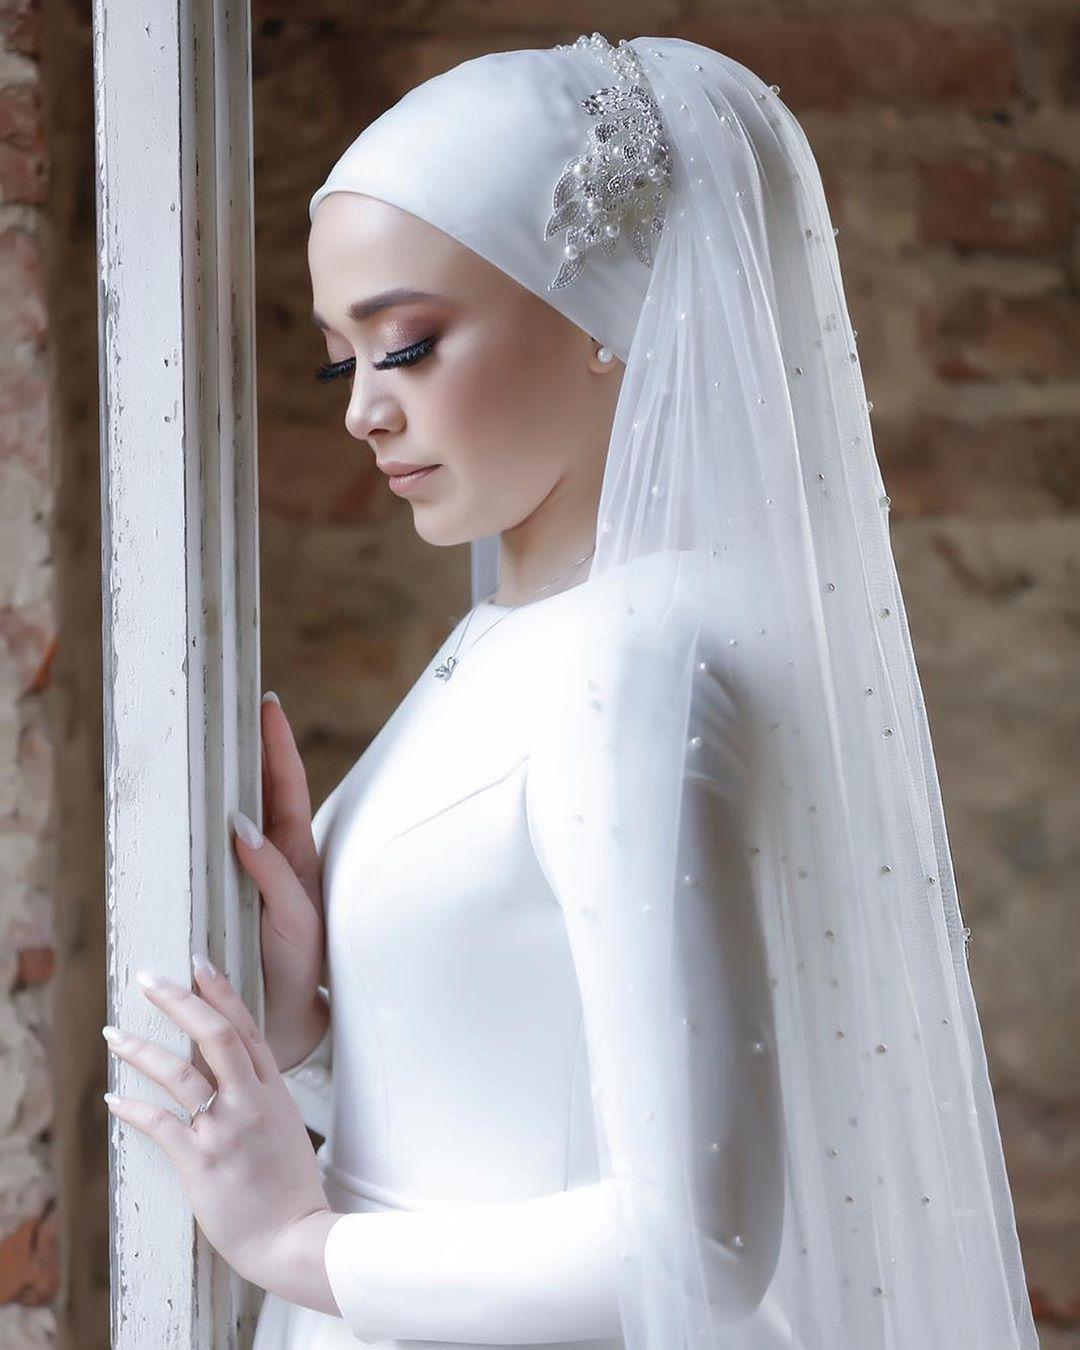 Elegant Simple Bridal Hijab With Embellished Lave Applique And Trendy Polca Dot Style Bridal Veil For Rea Bridal Hijab Styles Gothic Wedding Dress Bridal Hijab